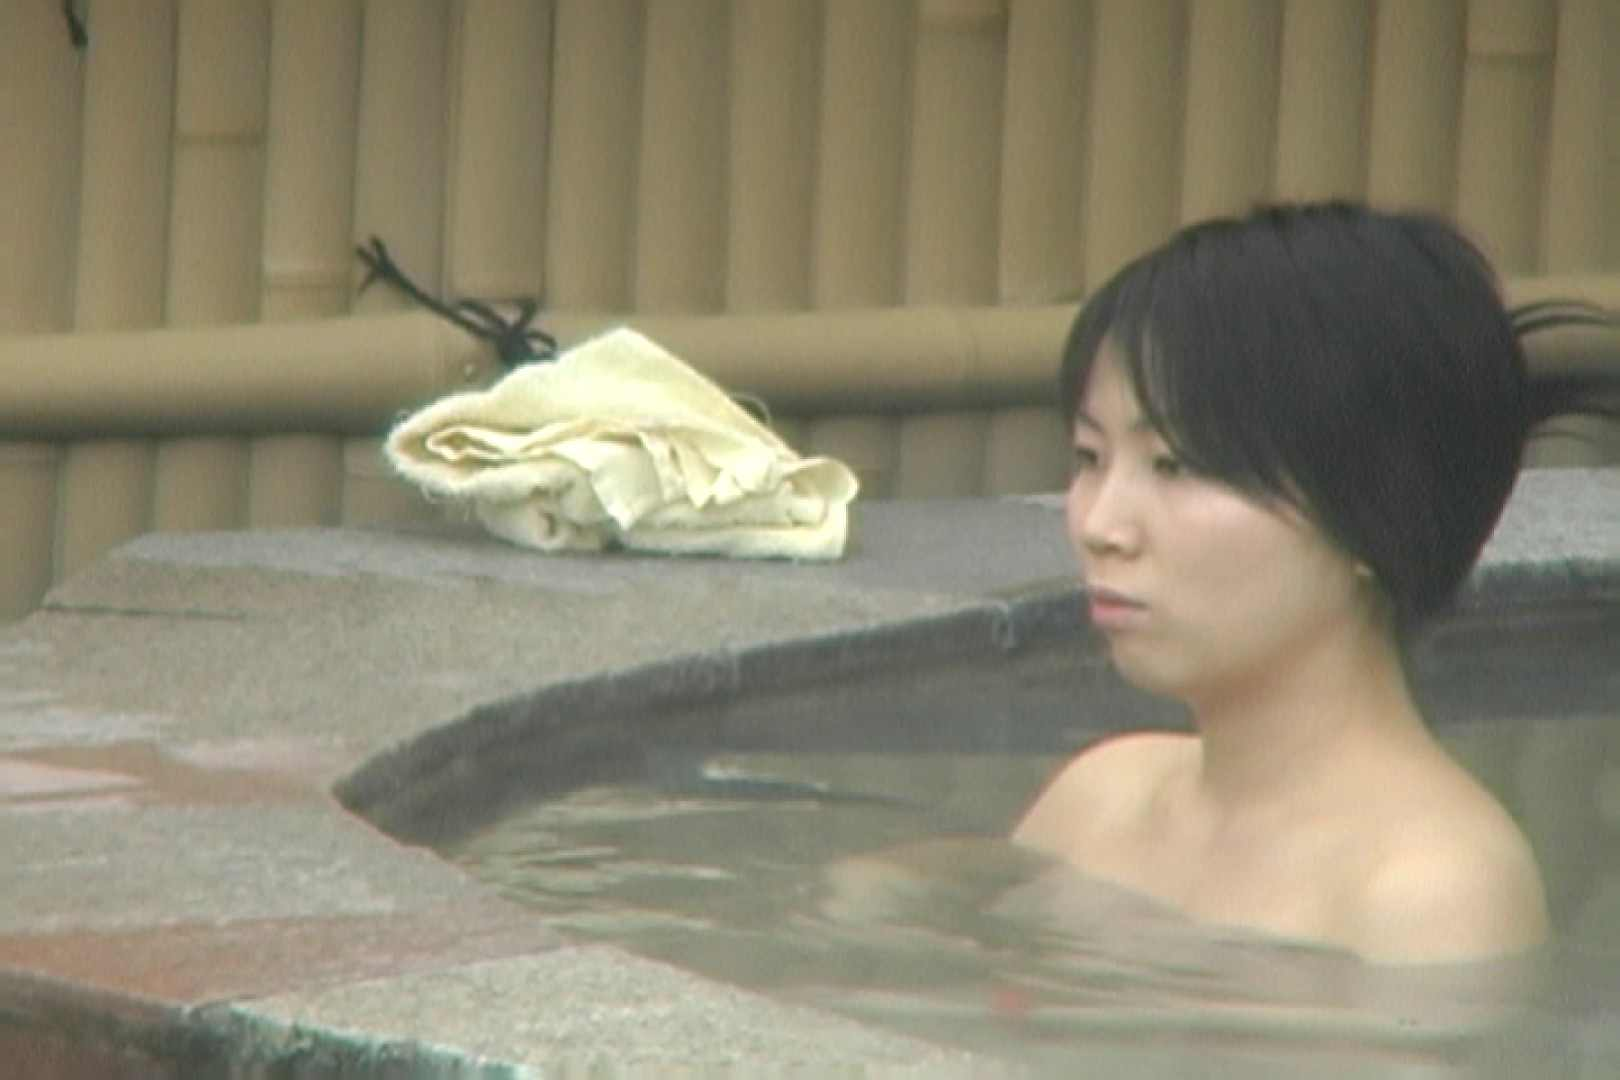 Aquaな露天風呂Vol.567 0  105連発 66